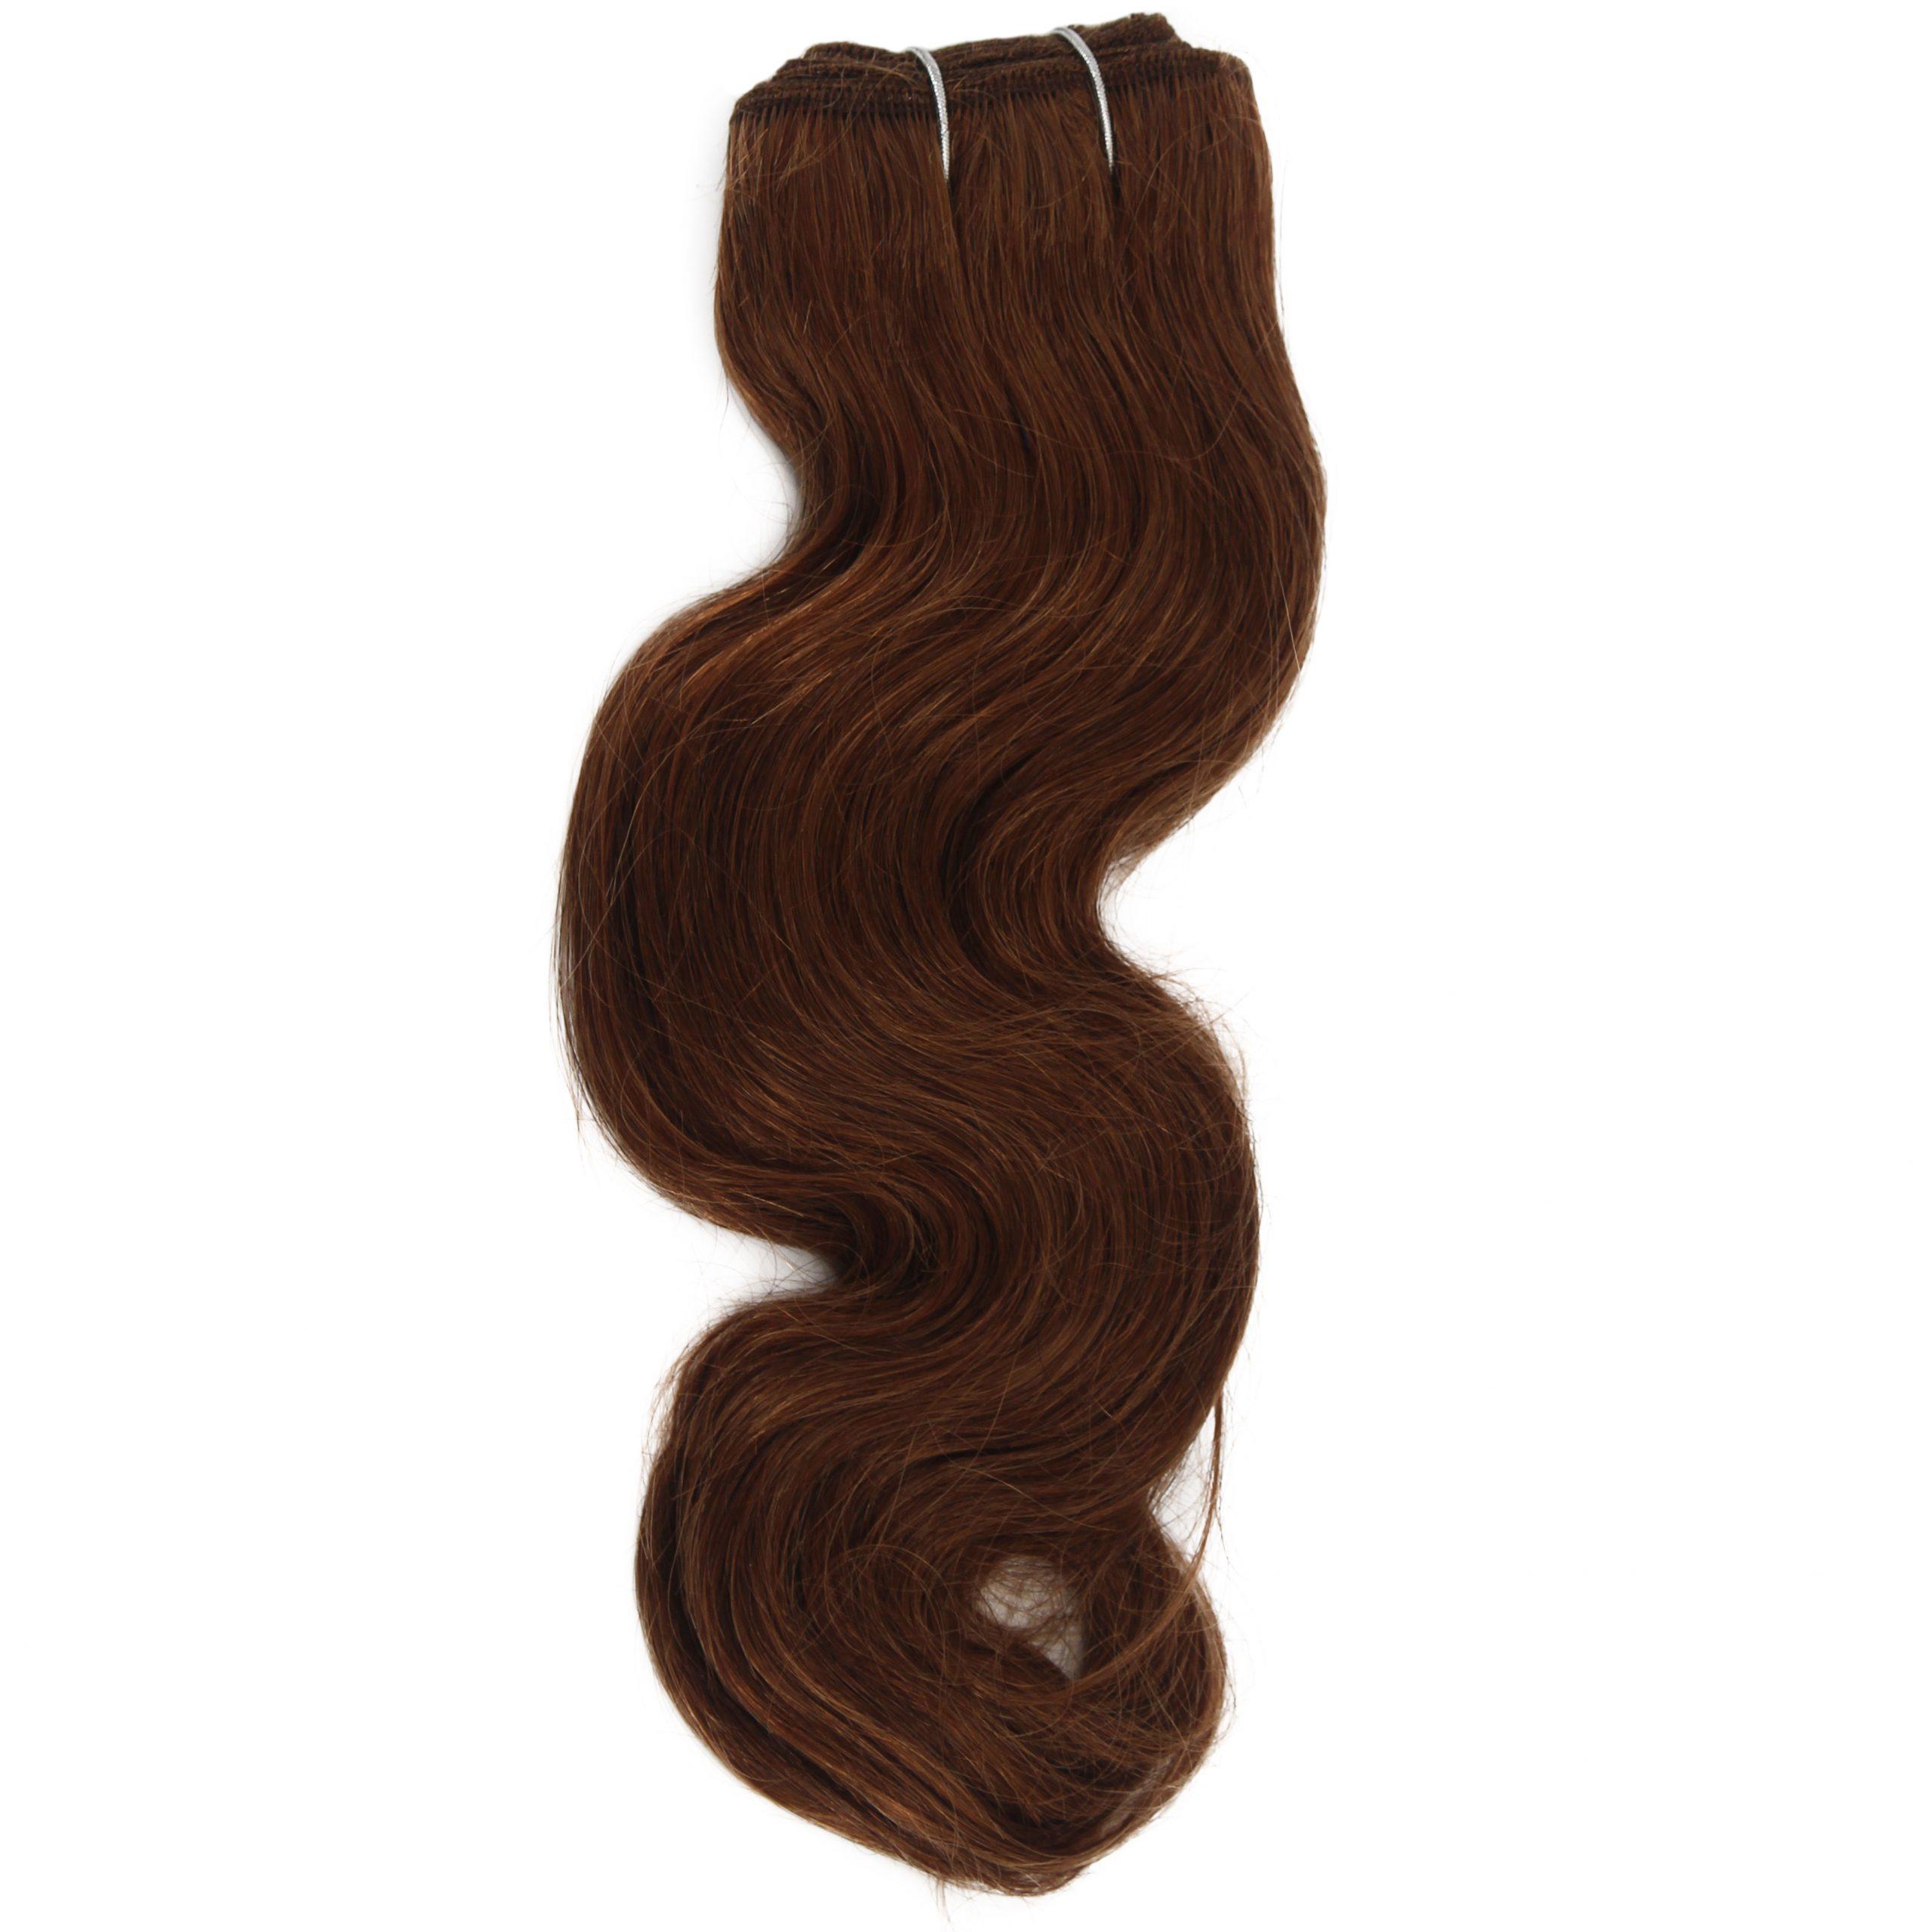 BODY WAVE 100% HUMAN HAIR 8 Inch - 30